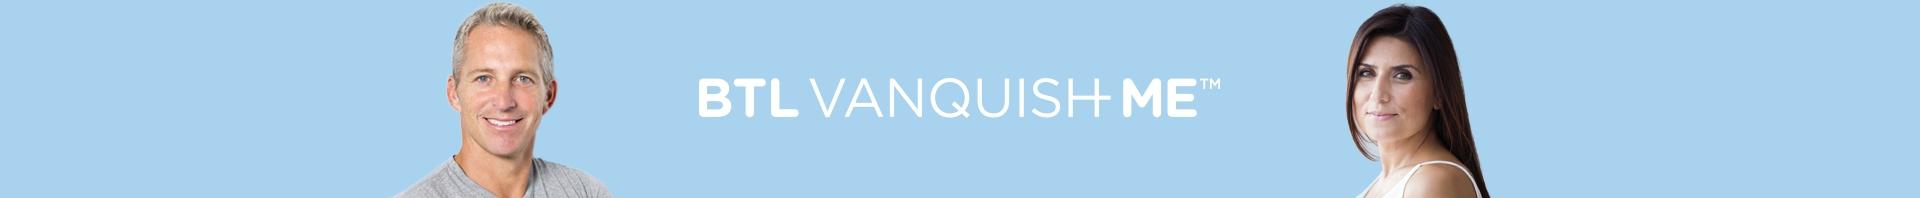 header-vanquish